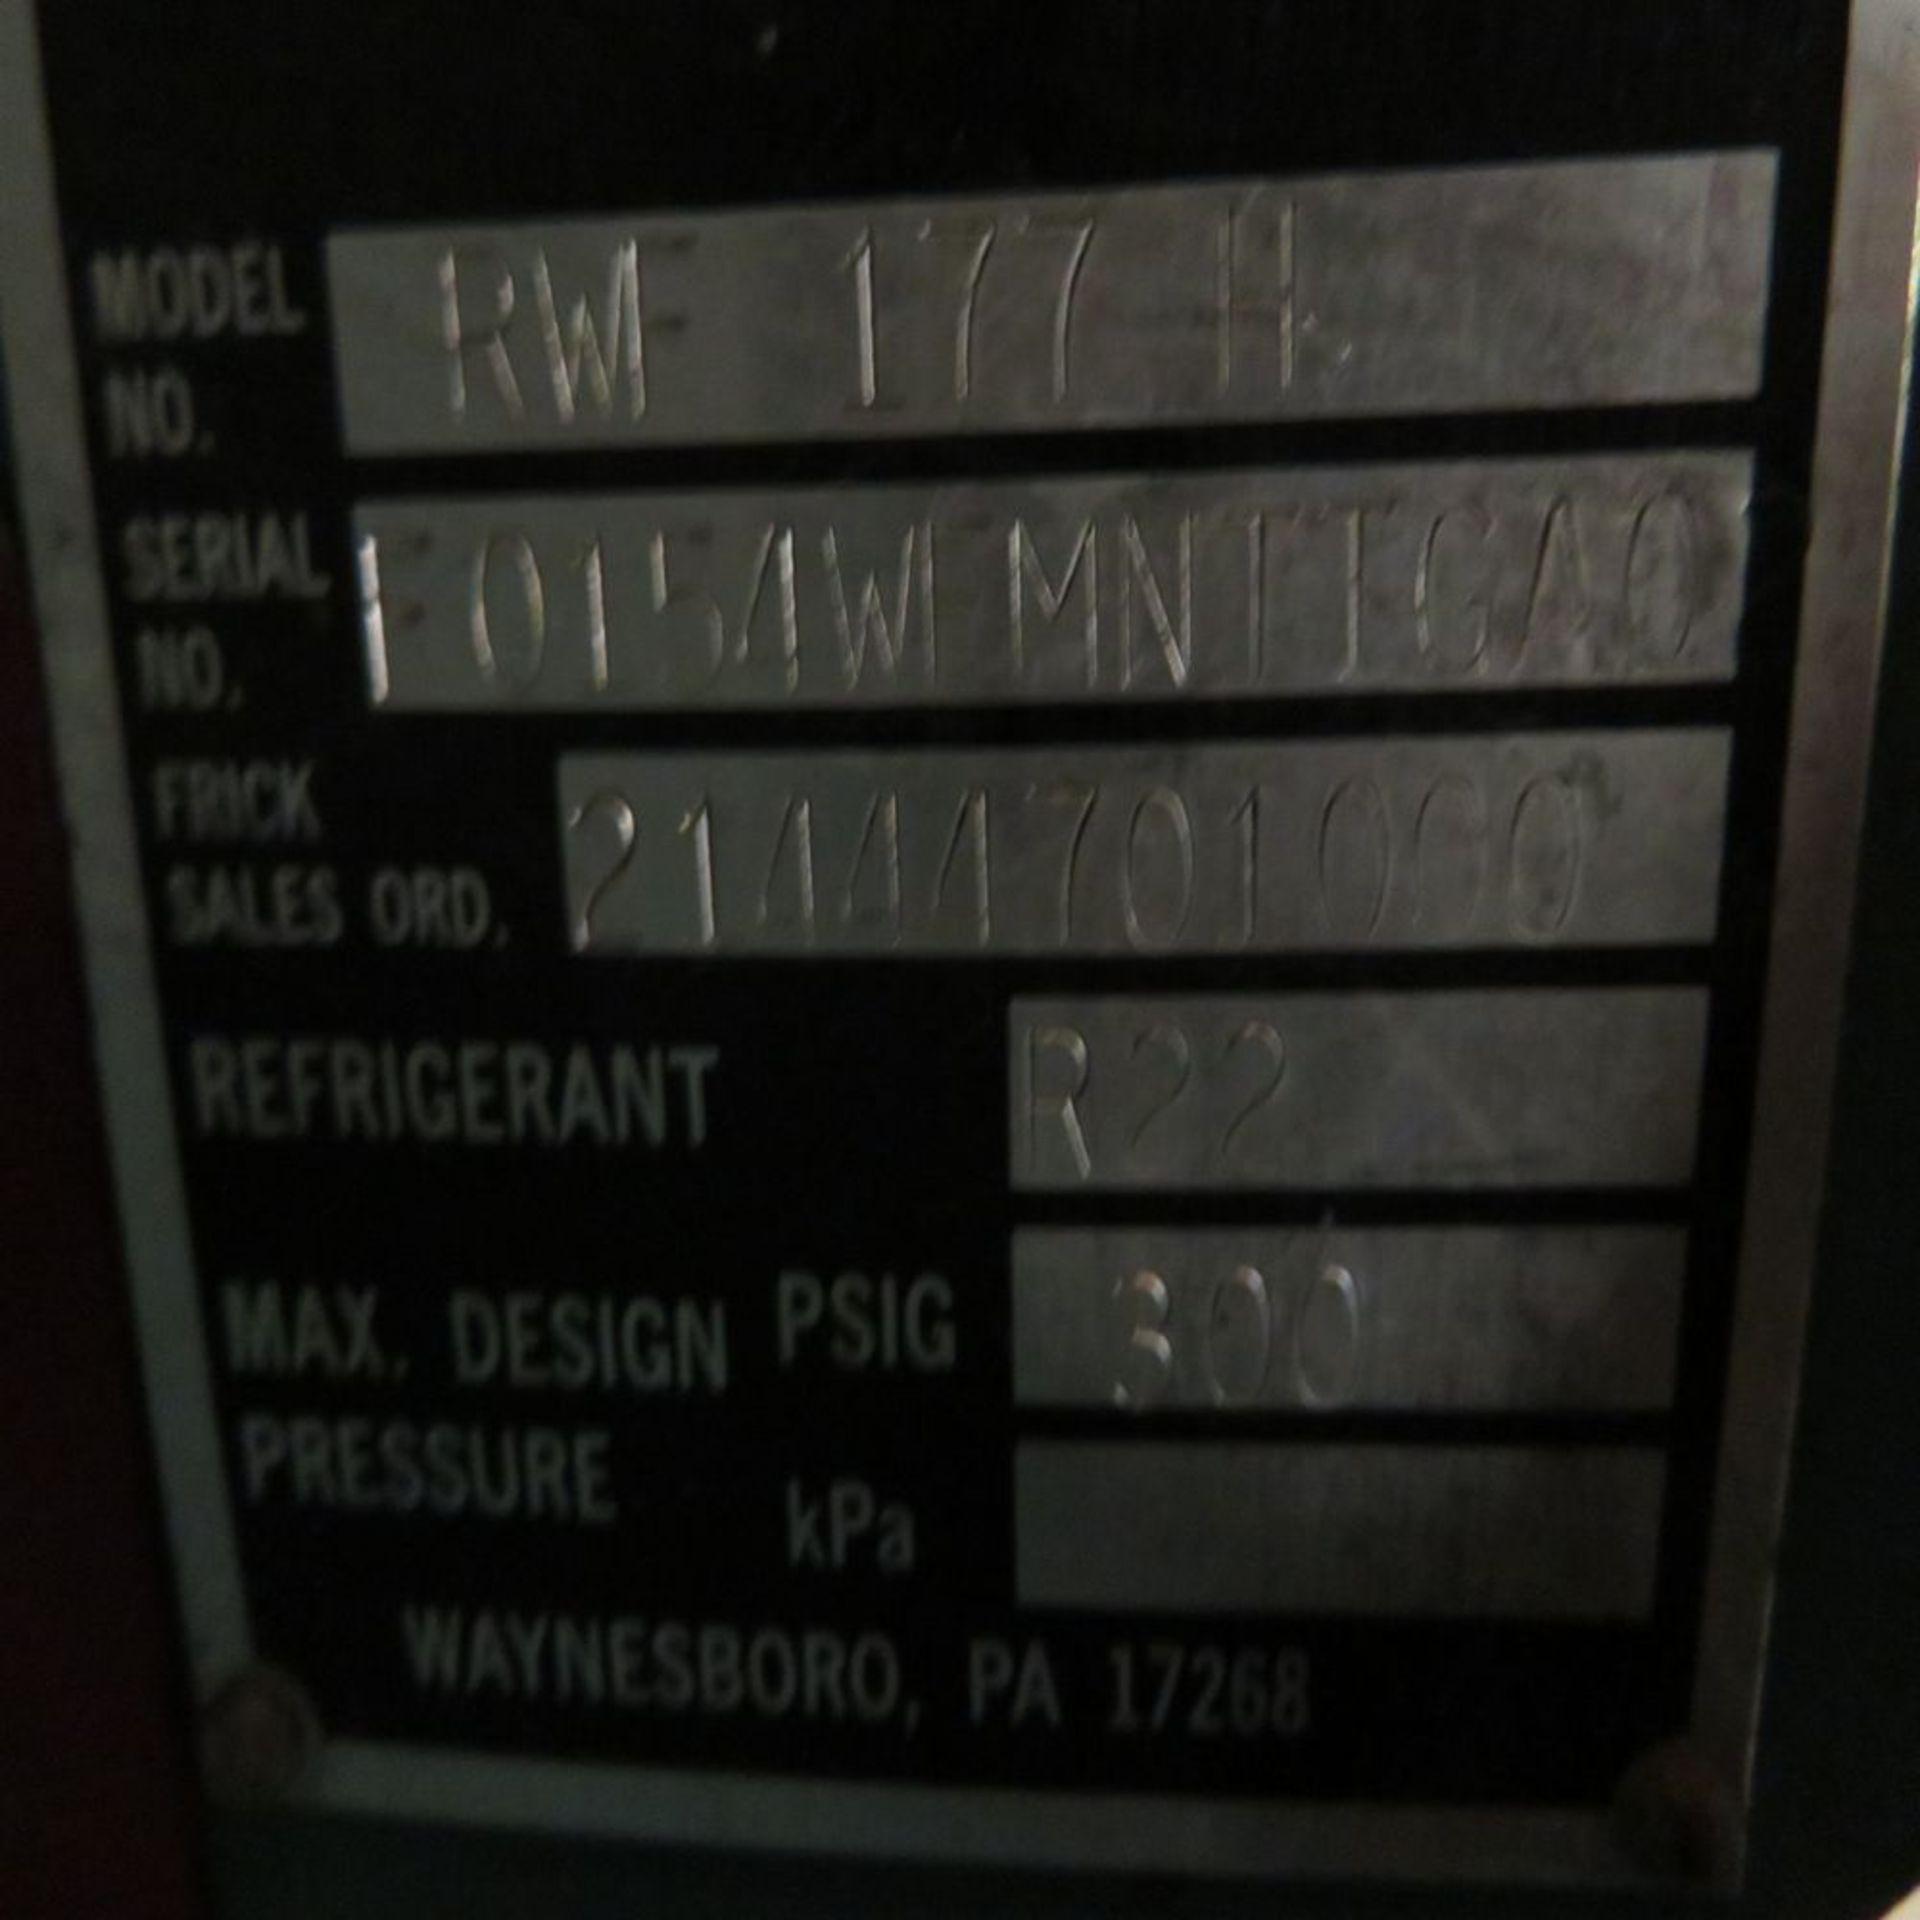 (Lot) Frick mod. RWF-177-H, Rotary Screw Air - Image 7 of 7